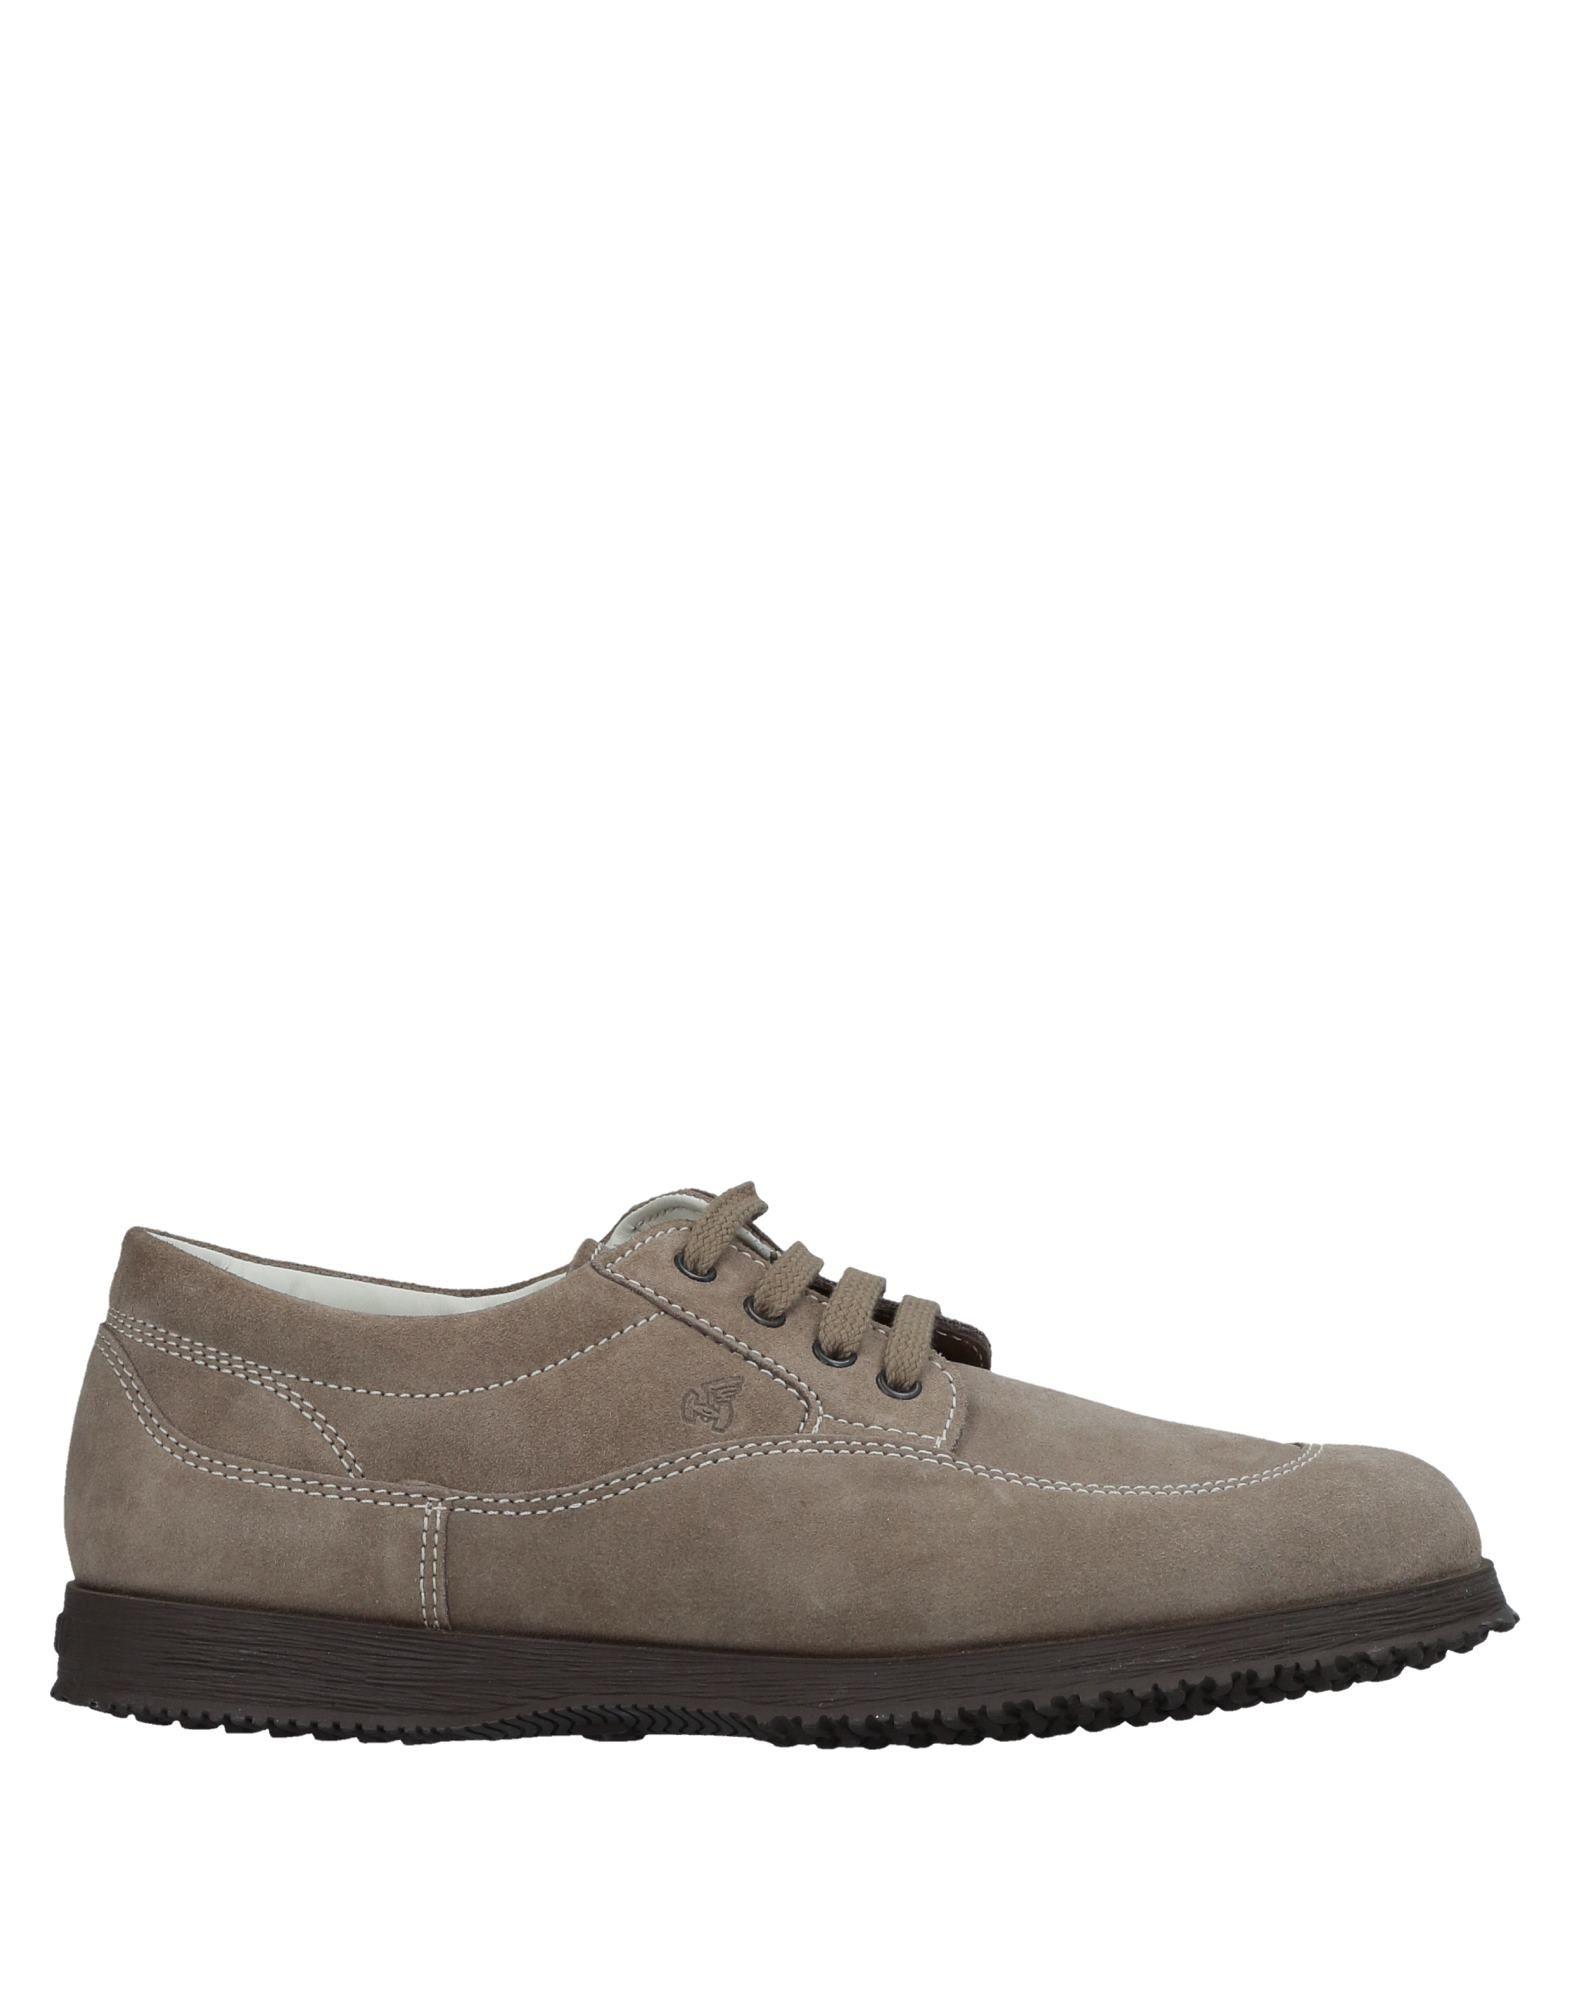 Moda Sneakers Hogan Uomo - 11528504TN